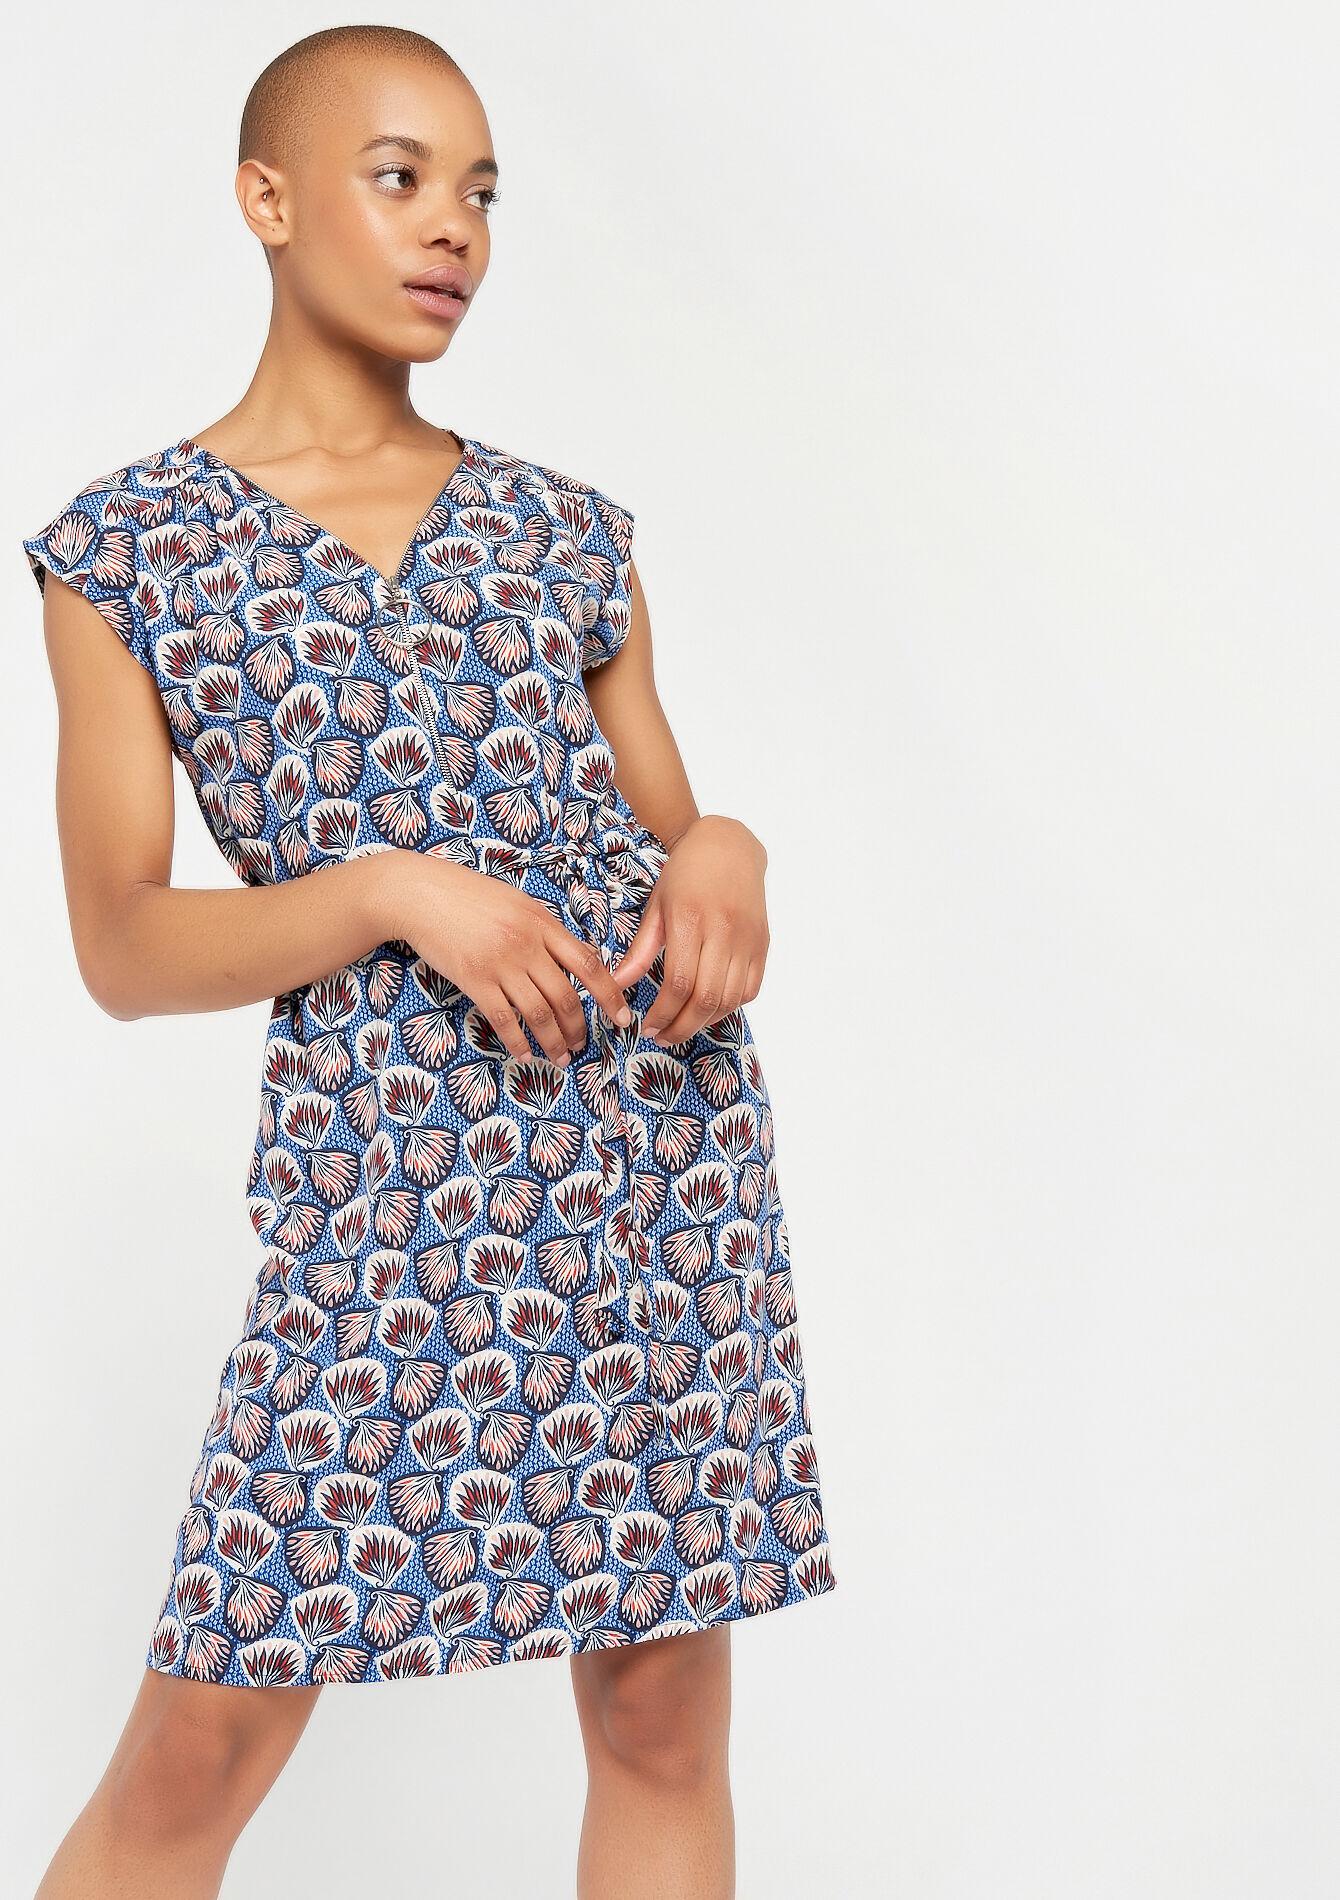 Mouwloze rechte jurk - BLUE ELECTRICAL - 08100712_2805